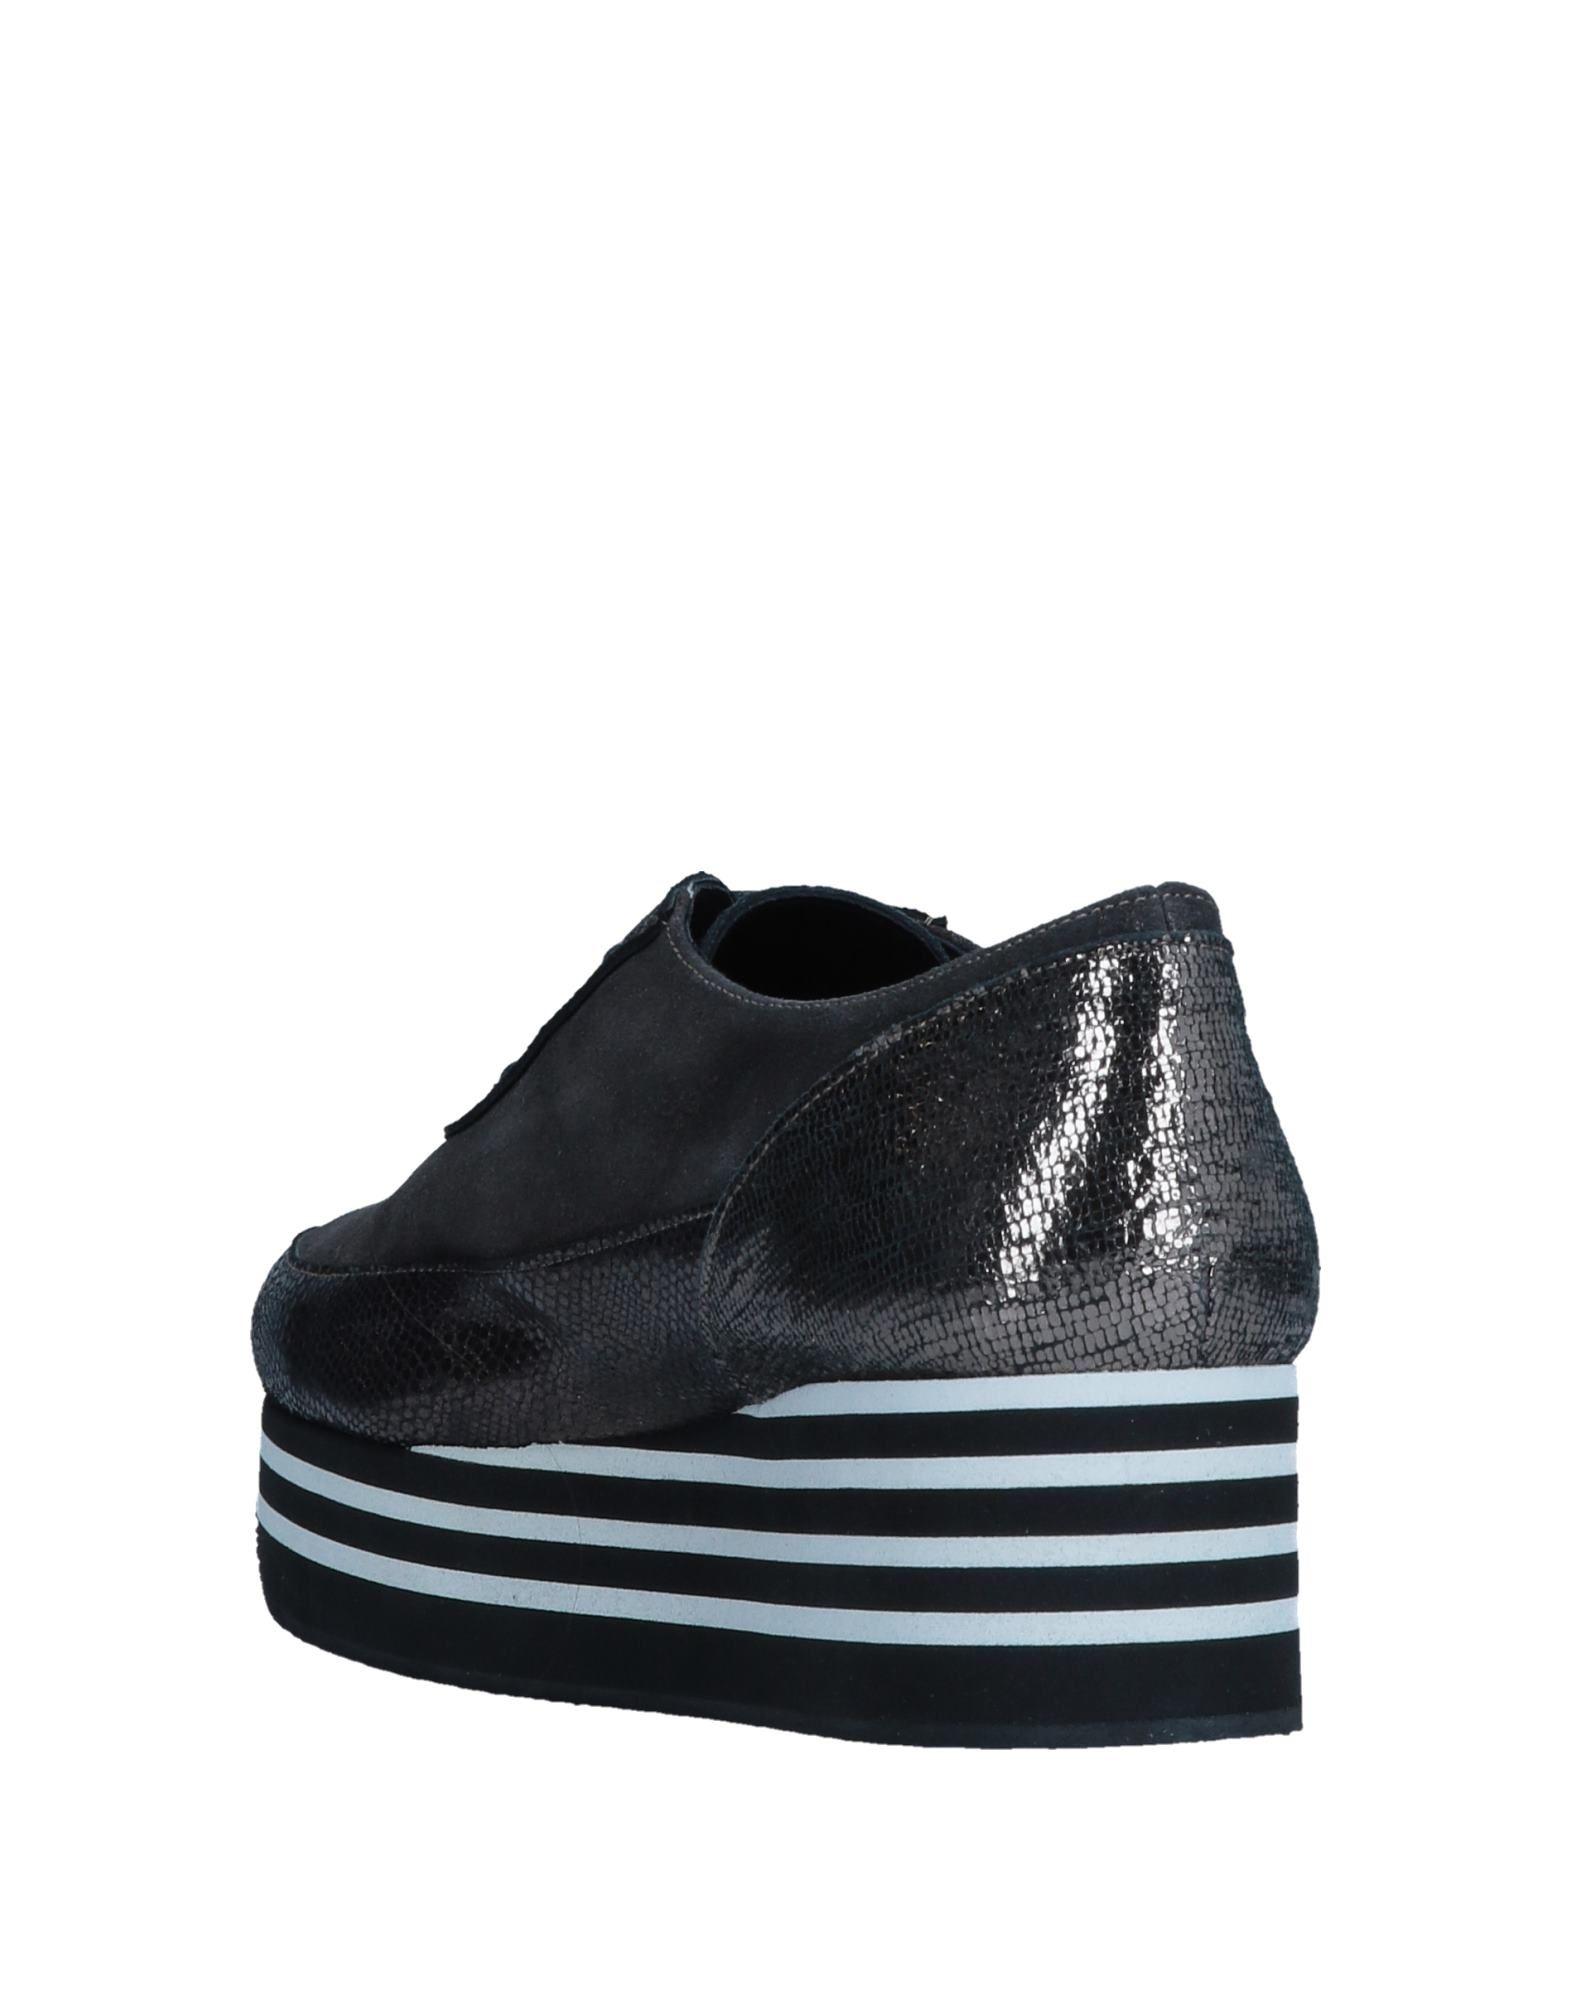 Anaki Gute Sneakers Damen  11547405OM Gute Anaki Qualität beliebte Schuhe a9ec91